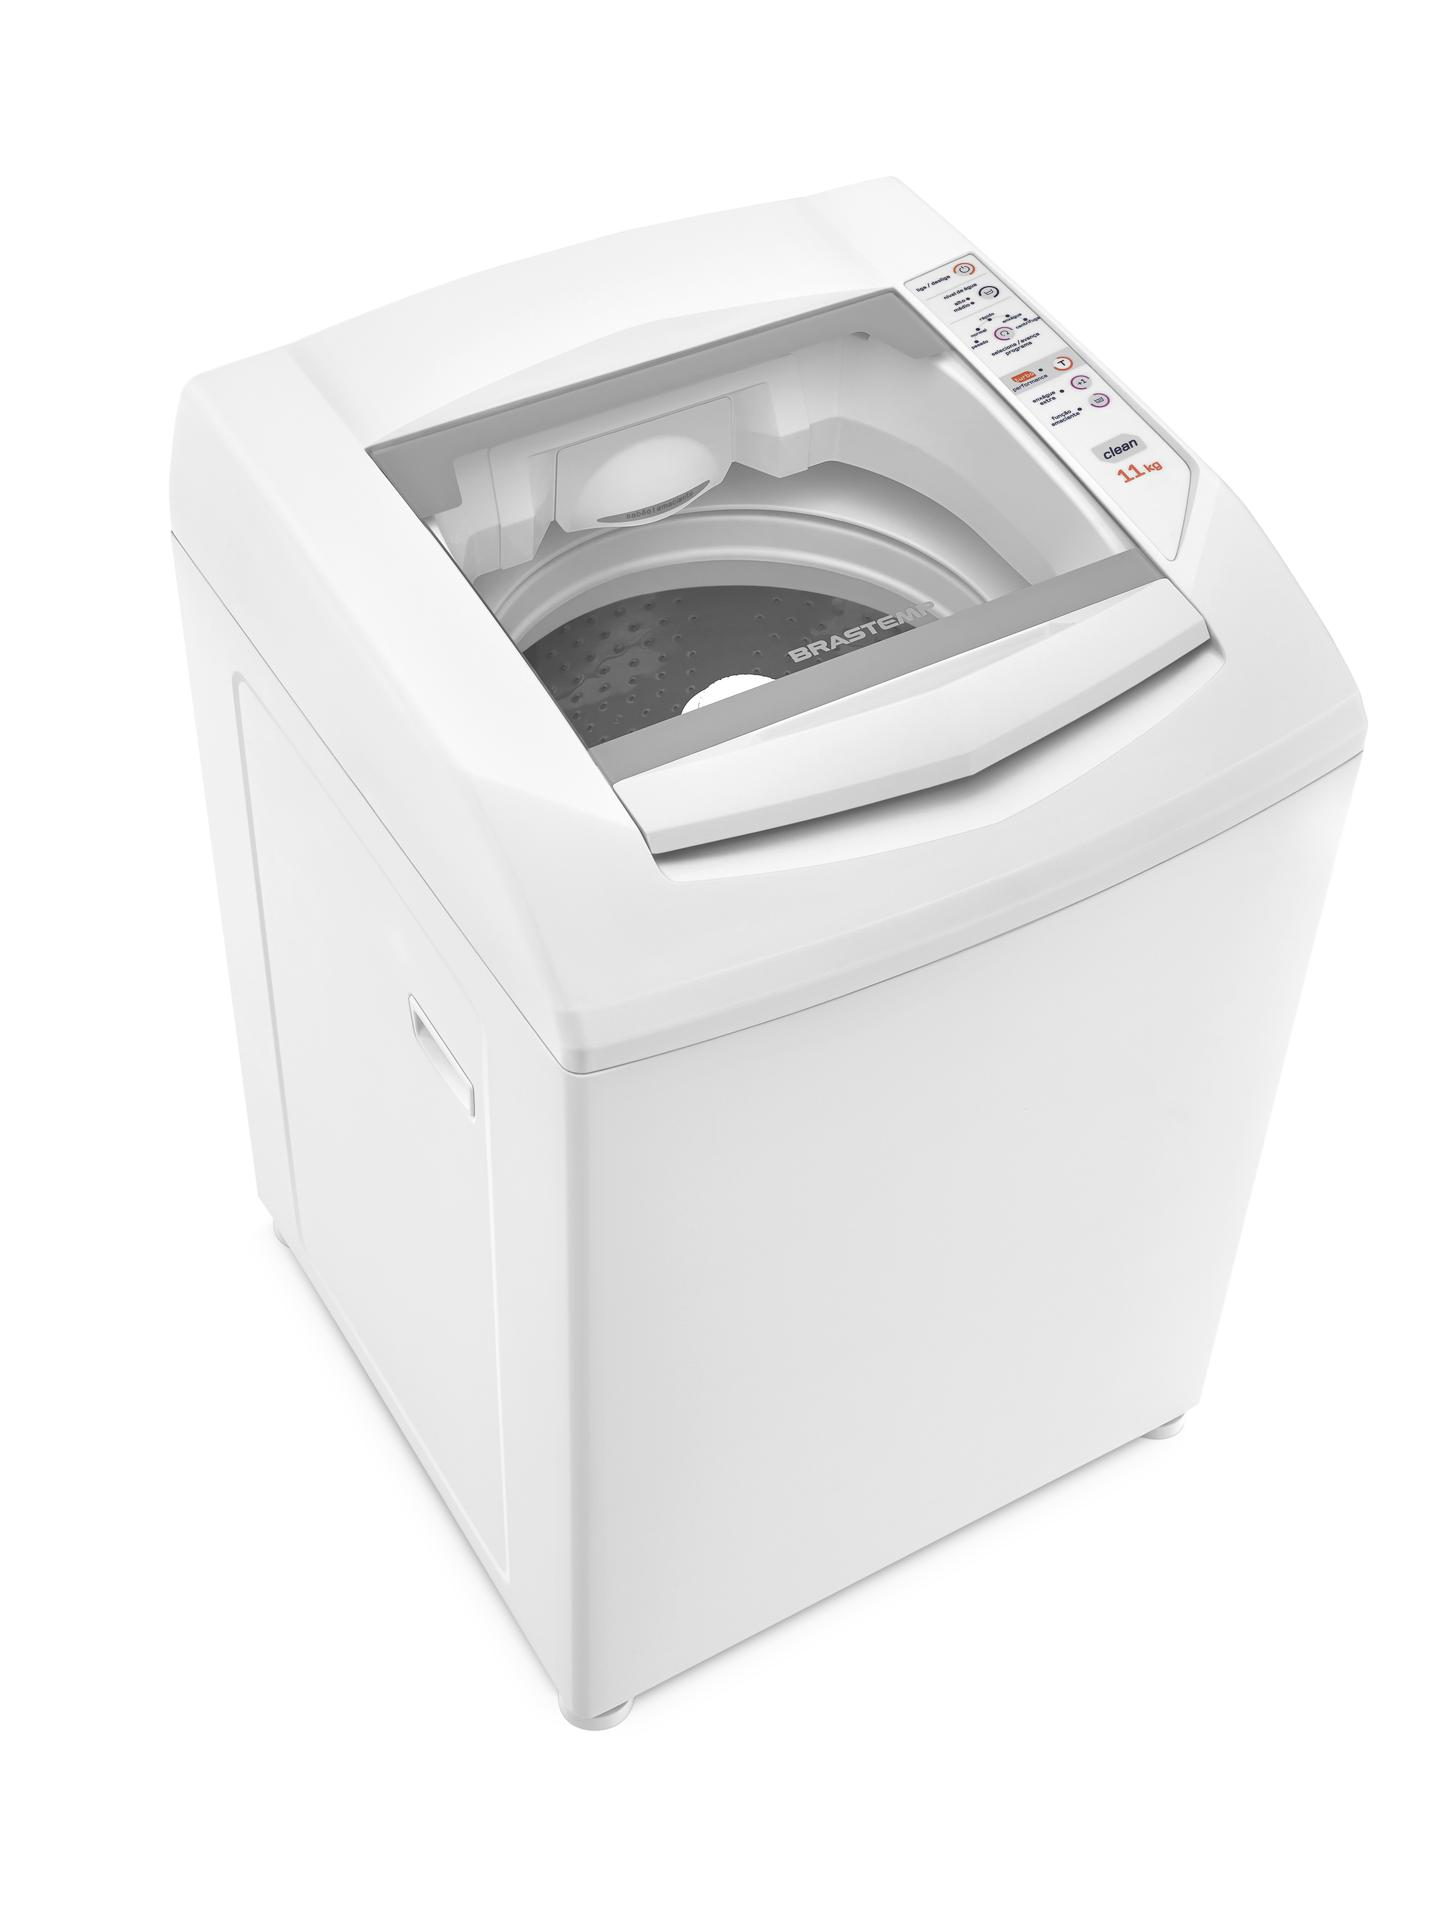 Lavadora de Roupas Automática Brastemp Clean 11 Kg Branca BWC11ABBNA